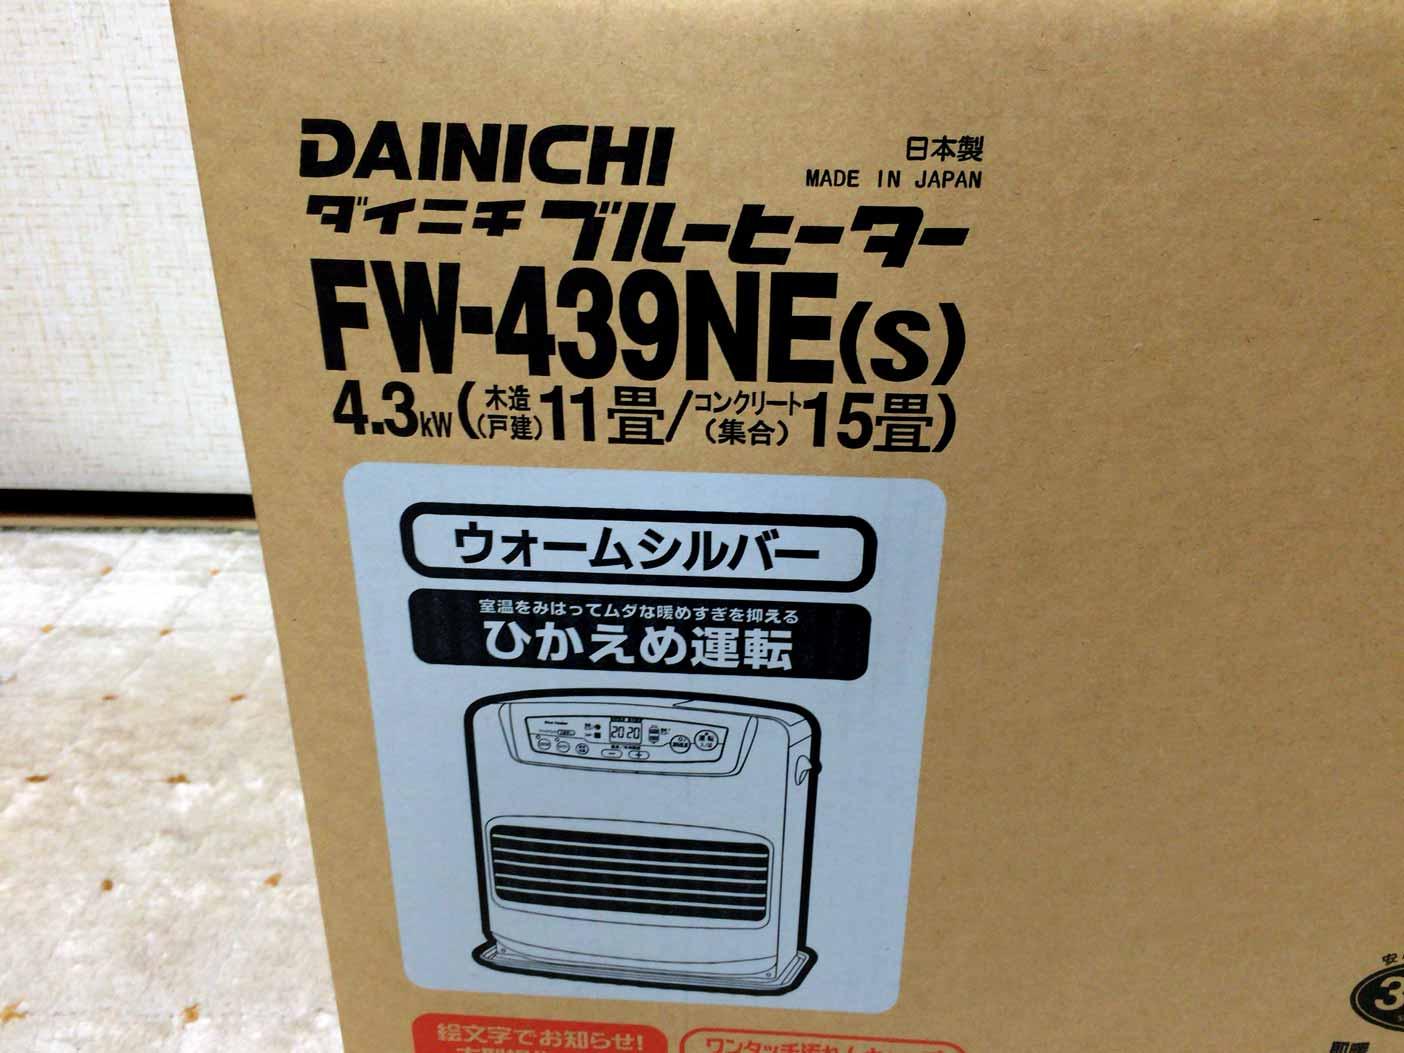 Dainichi fanheater003